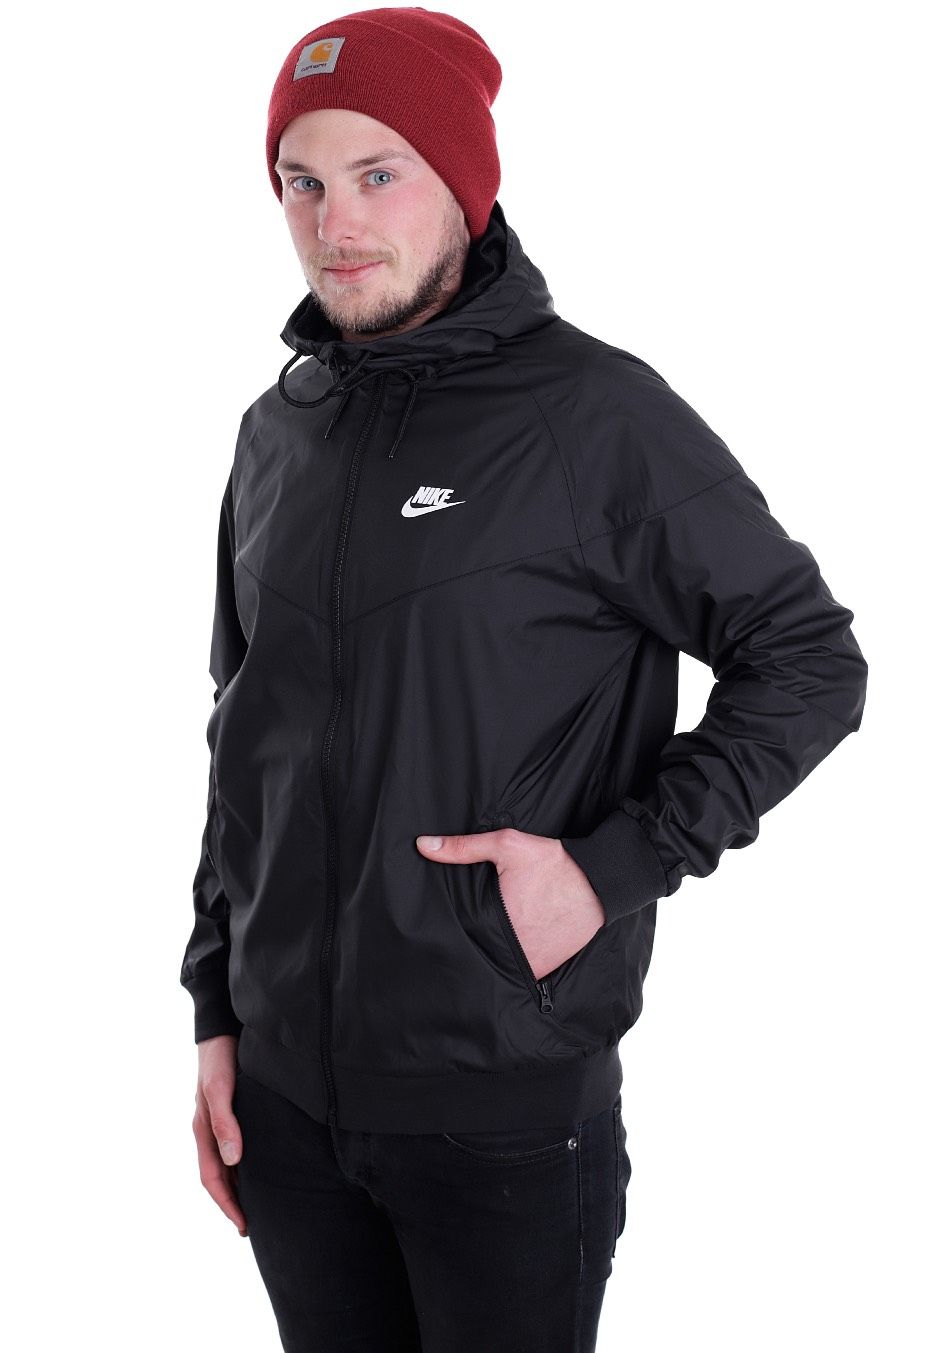 Nike - Windrunner Black Black Black White - Jacke - Streetwear Shop ... 007b913deb